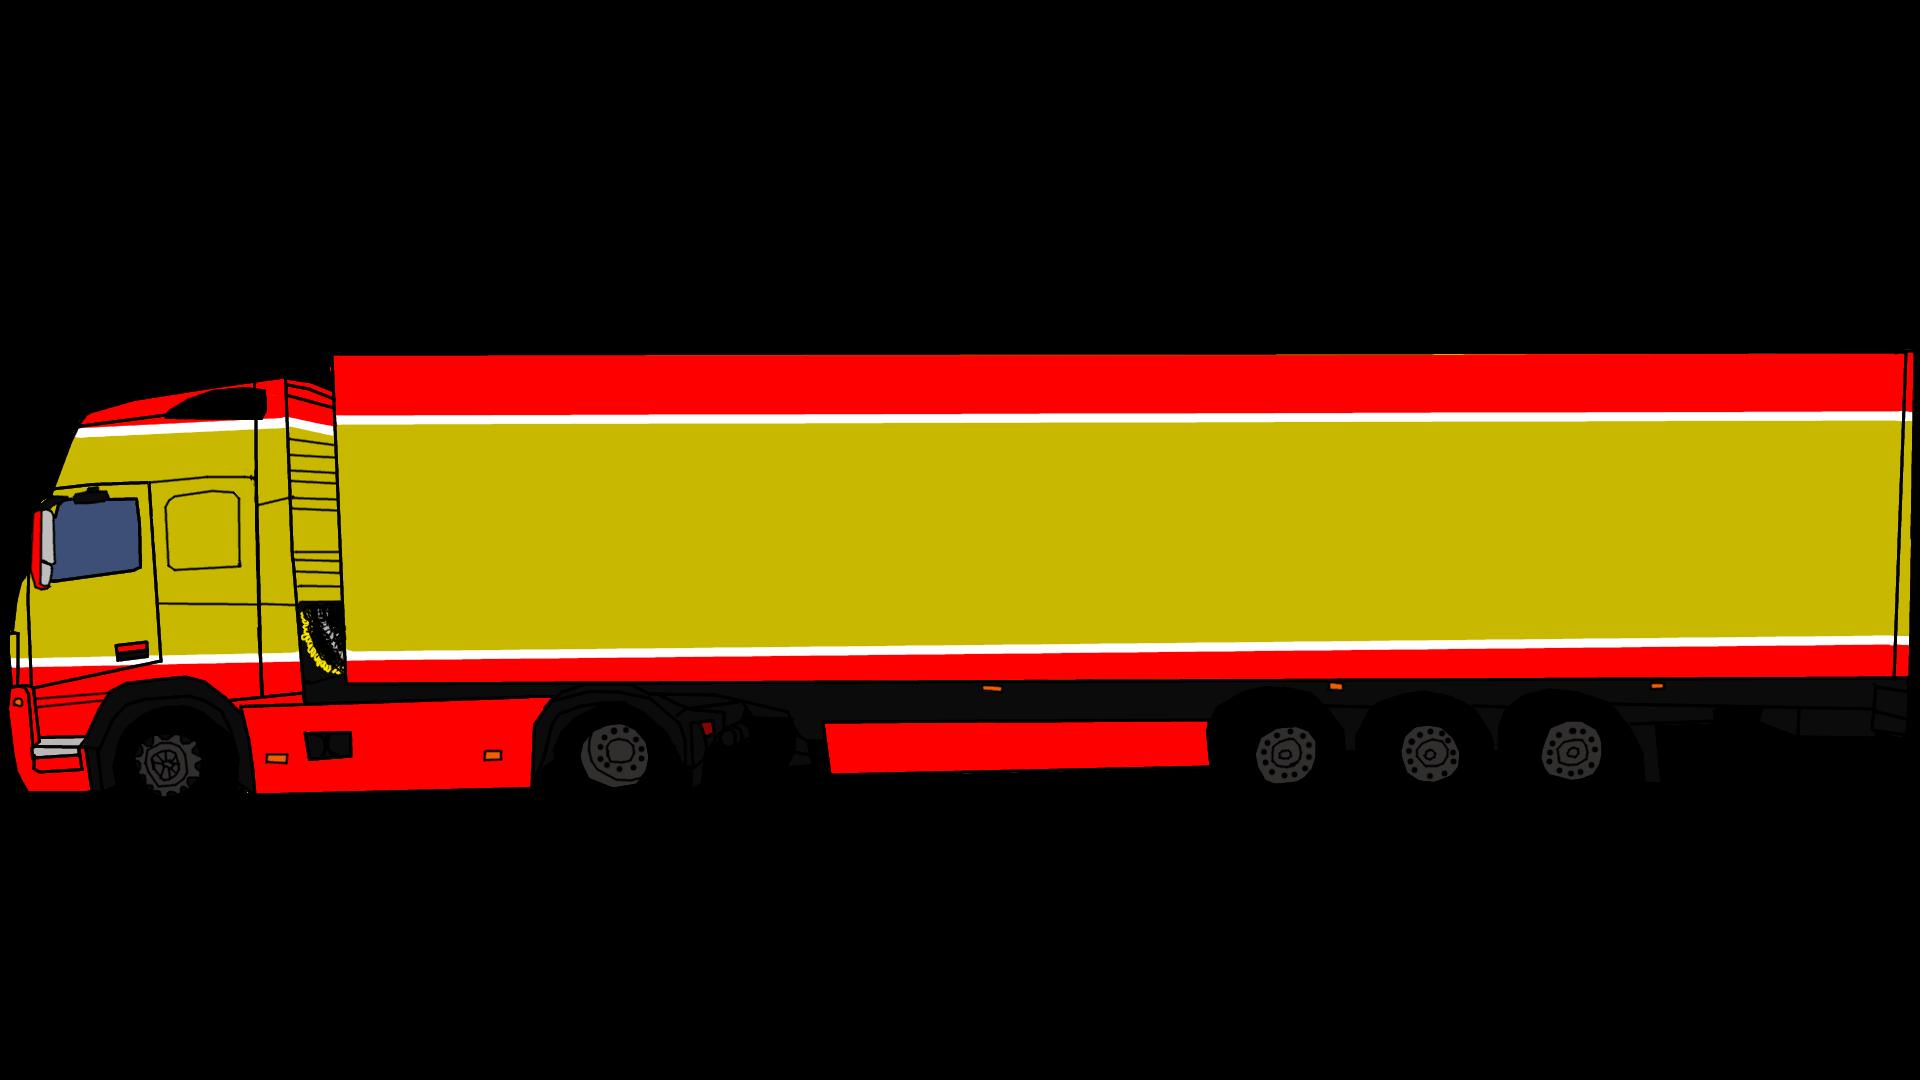 Semi truck grill clipart image library download Grill clipart semi truck, Grill semi truck Transparent FREE ... image library download